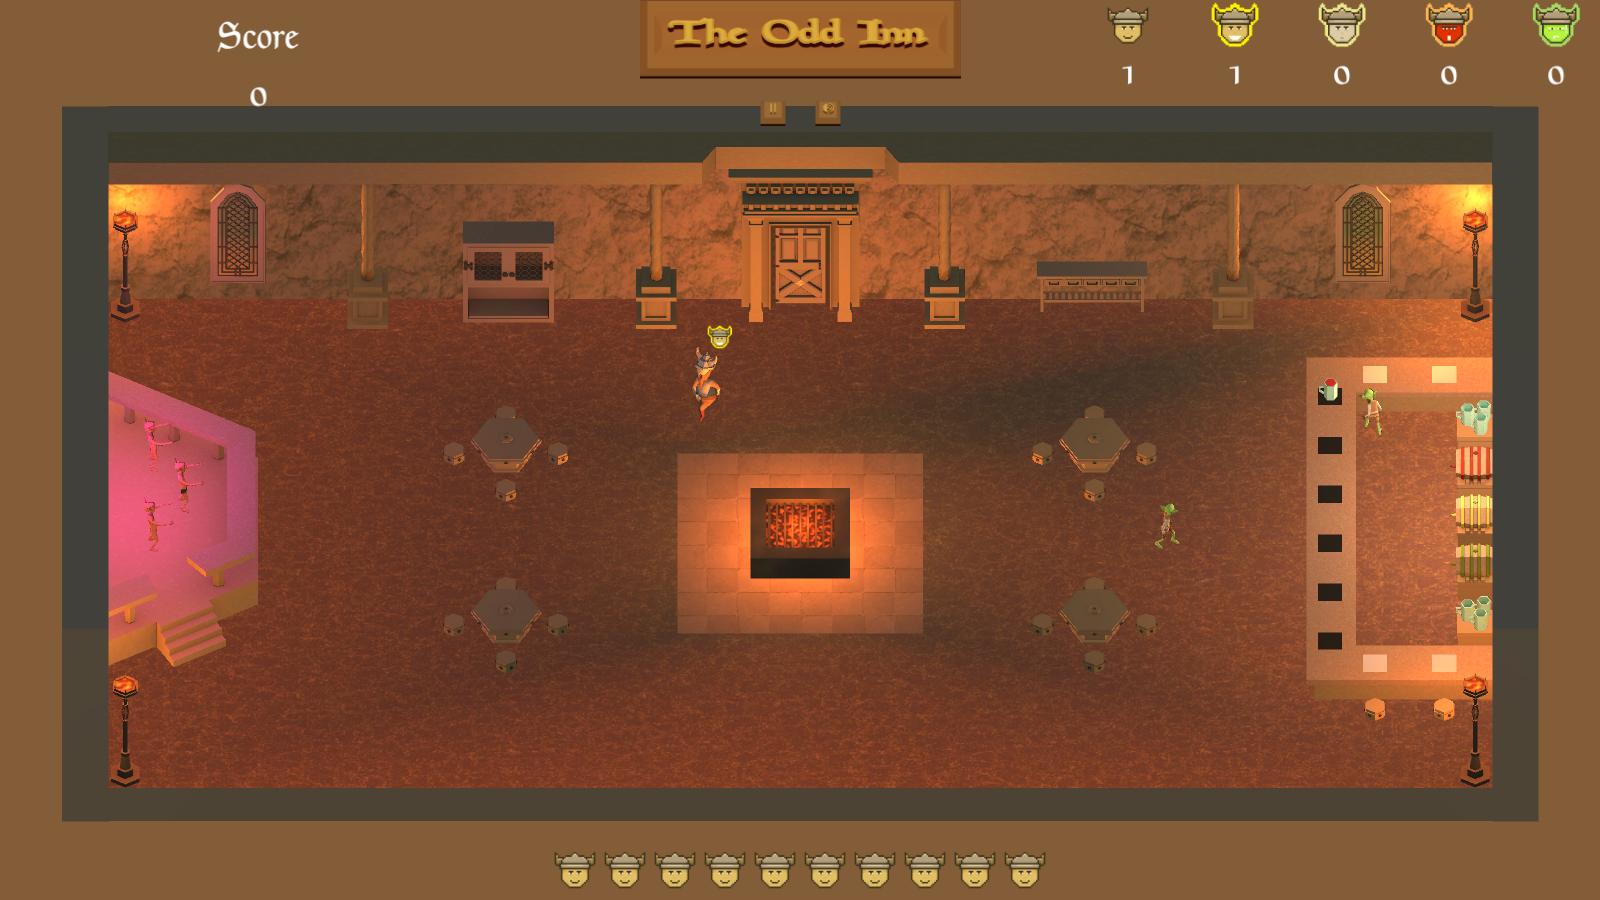 The Odd Inn